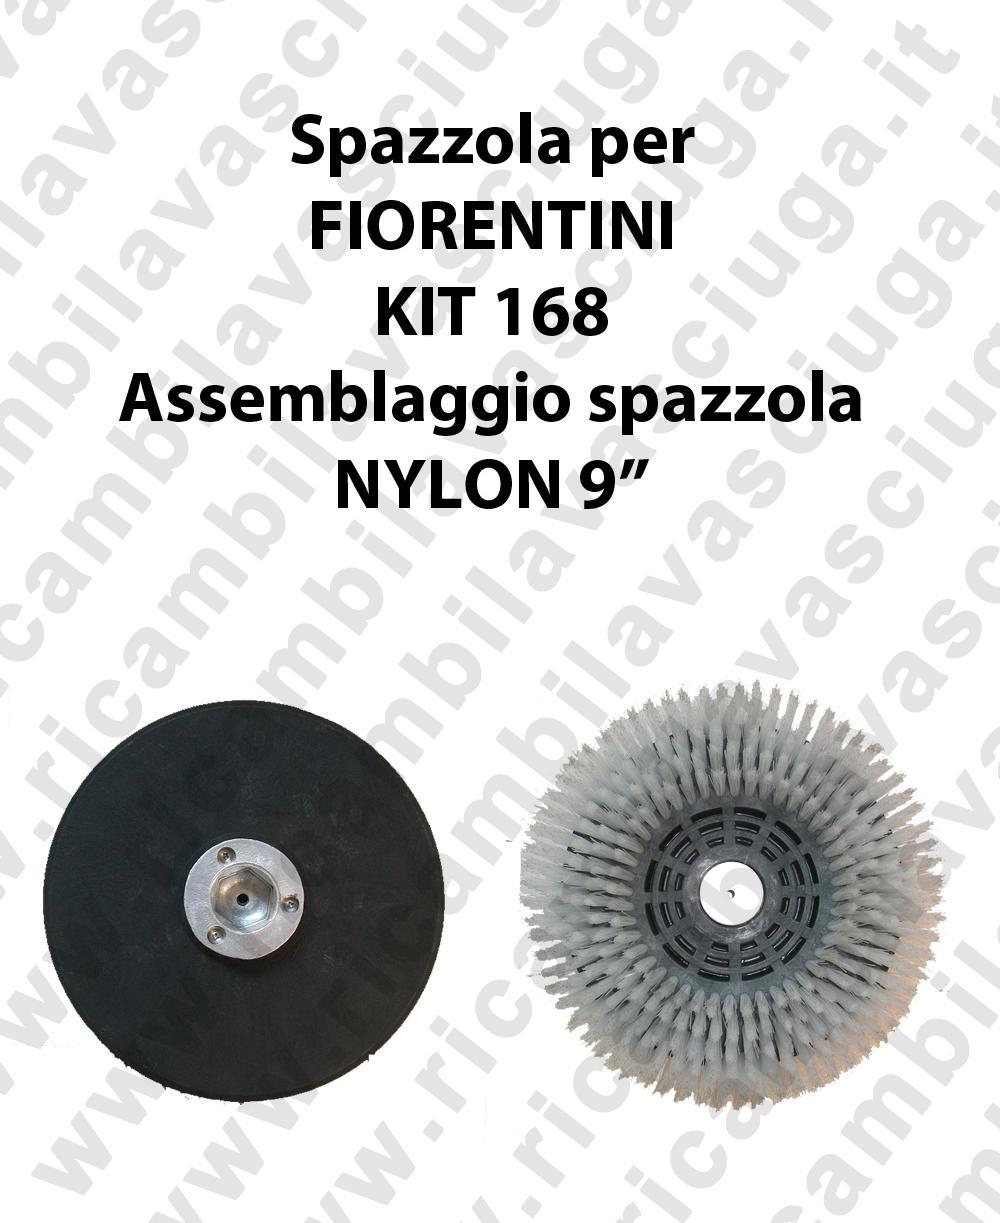 Spazzola NYLON per lavapavimenti FIORENTINI KIT 168